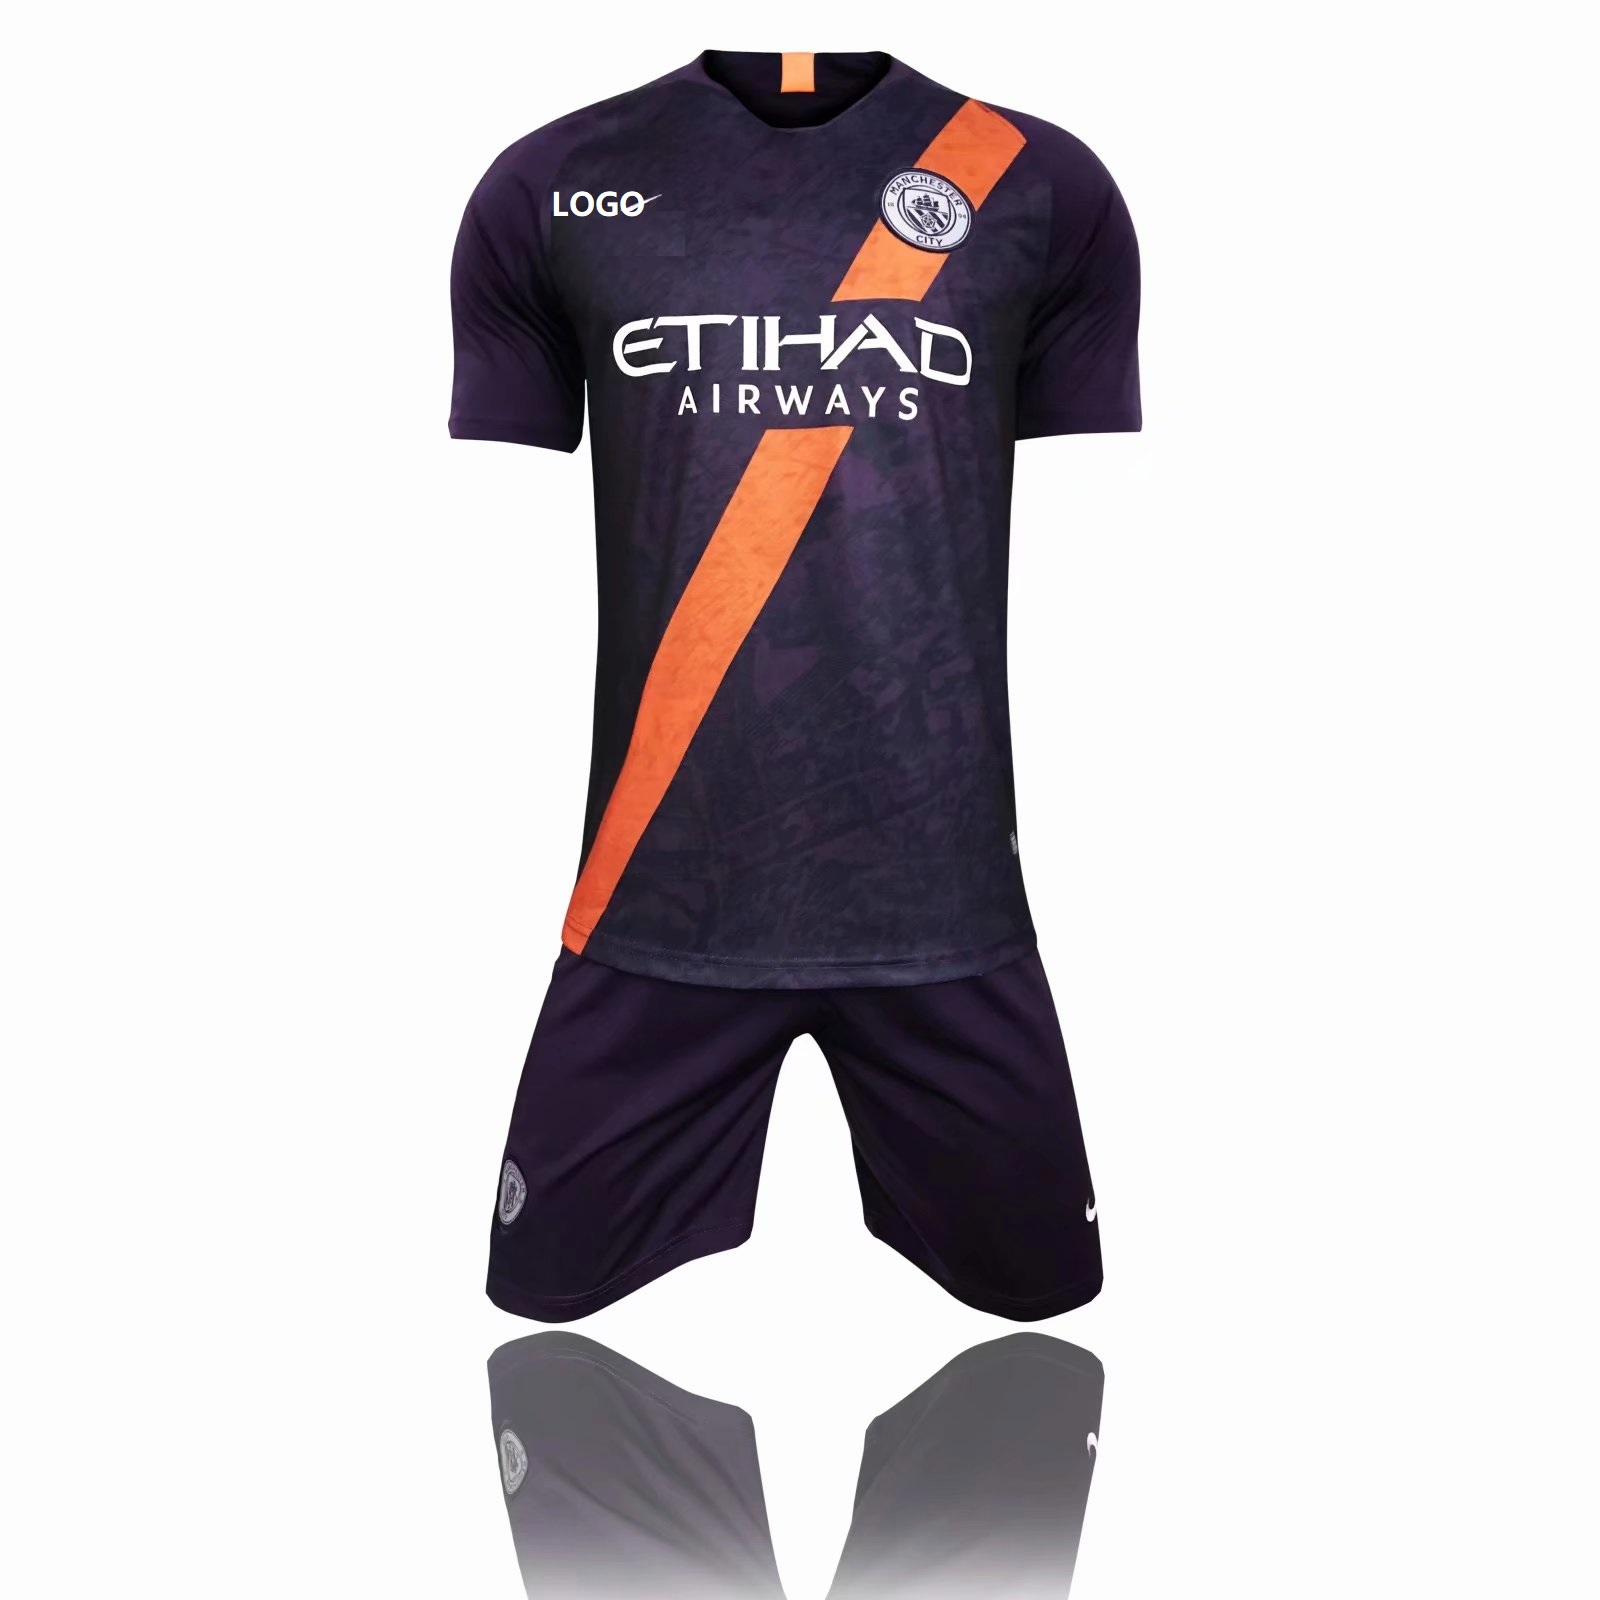 59bdc80c298 2018 19 AAA Men Manchester City third away Soccer Jersey Uniform Adult Football  Kits Custom Name Number